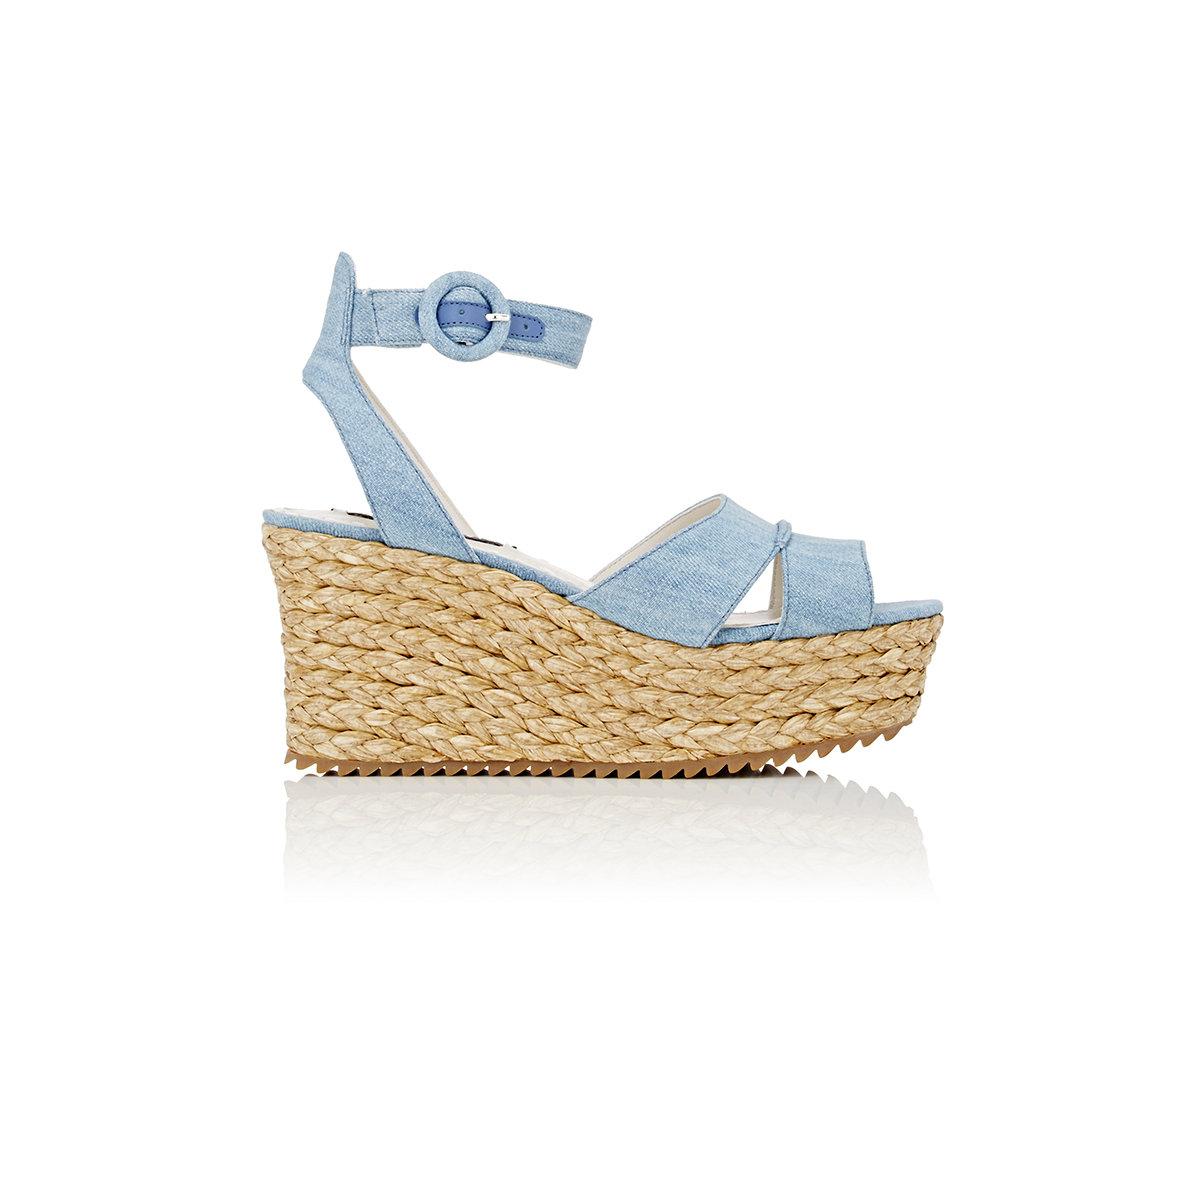 6576dfcba50 Lyst - Alice + Olivia Roberta Denim Platform-wedge Sandals in Blue